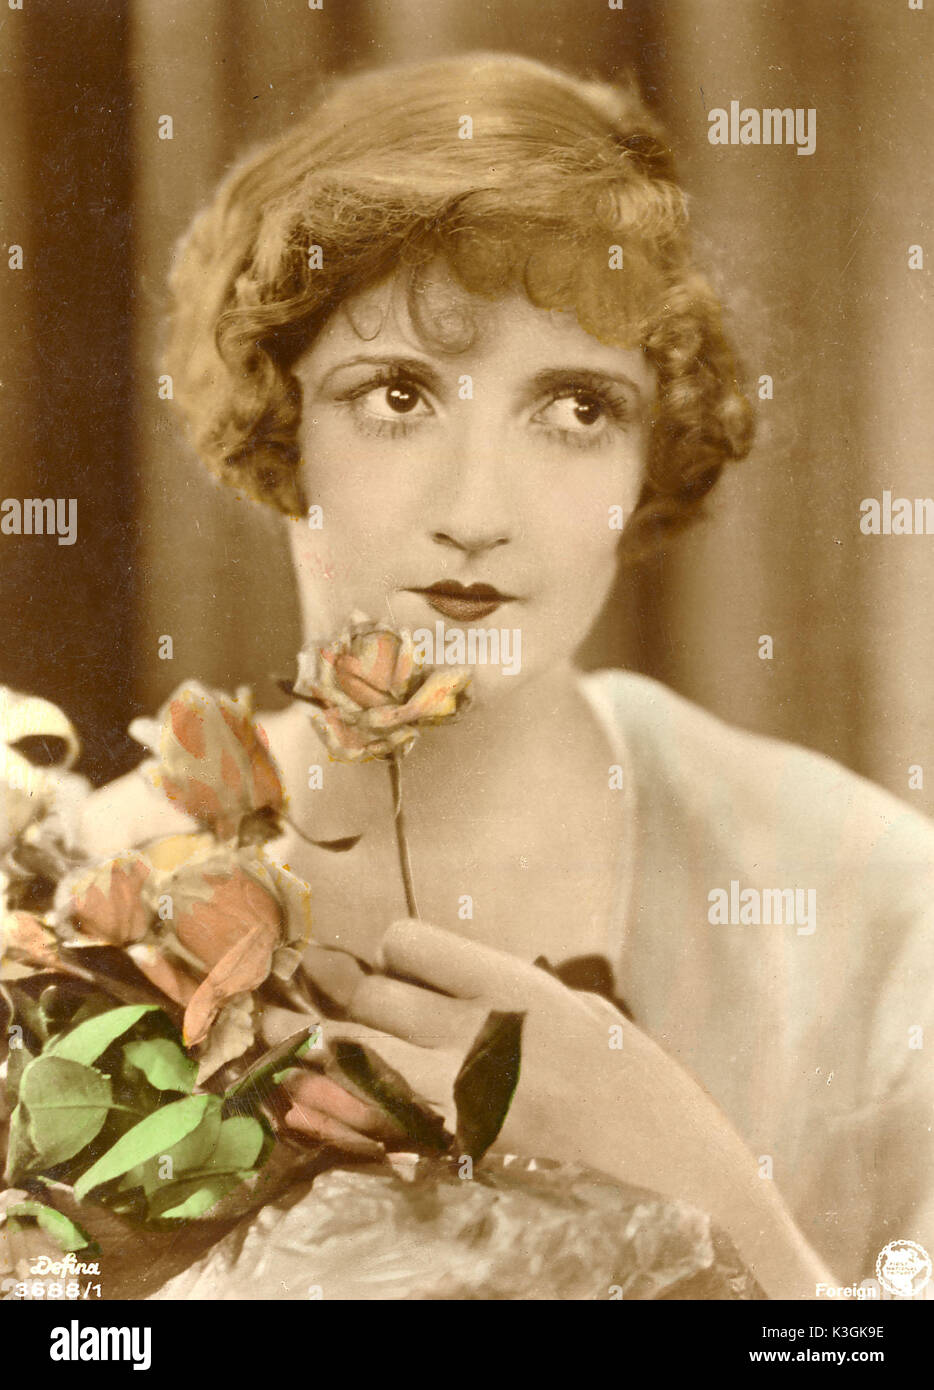 Kimmy Robertson,Whitney Port Hot images 070 Shake,Helen Wellington-Lloyd